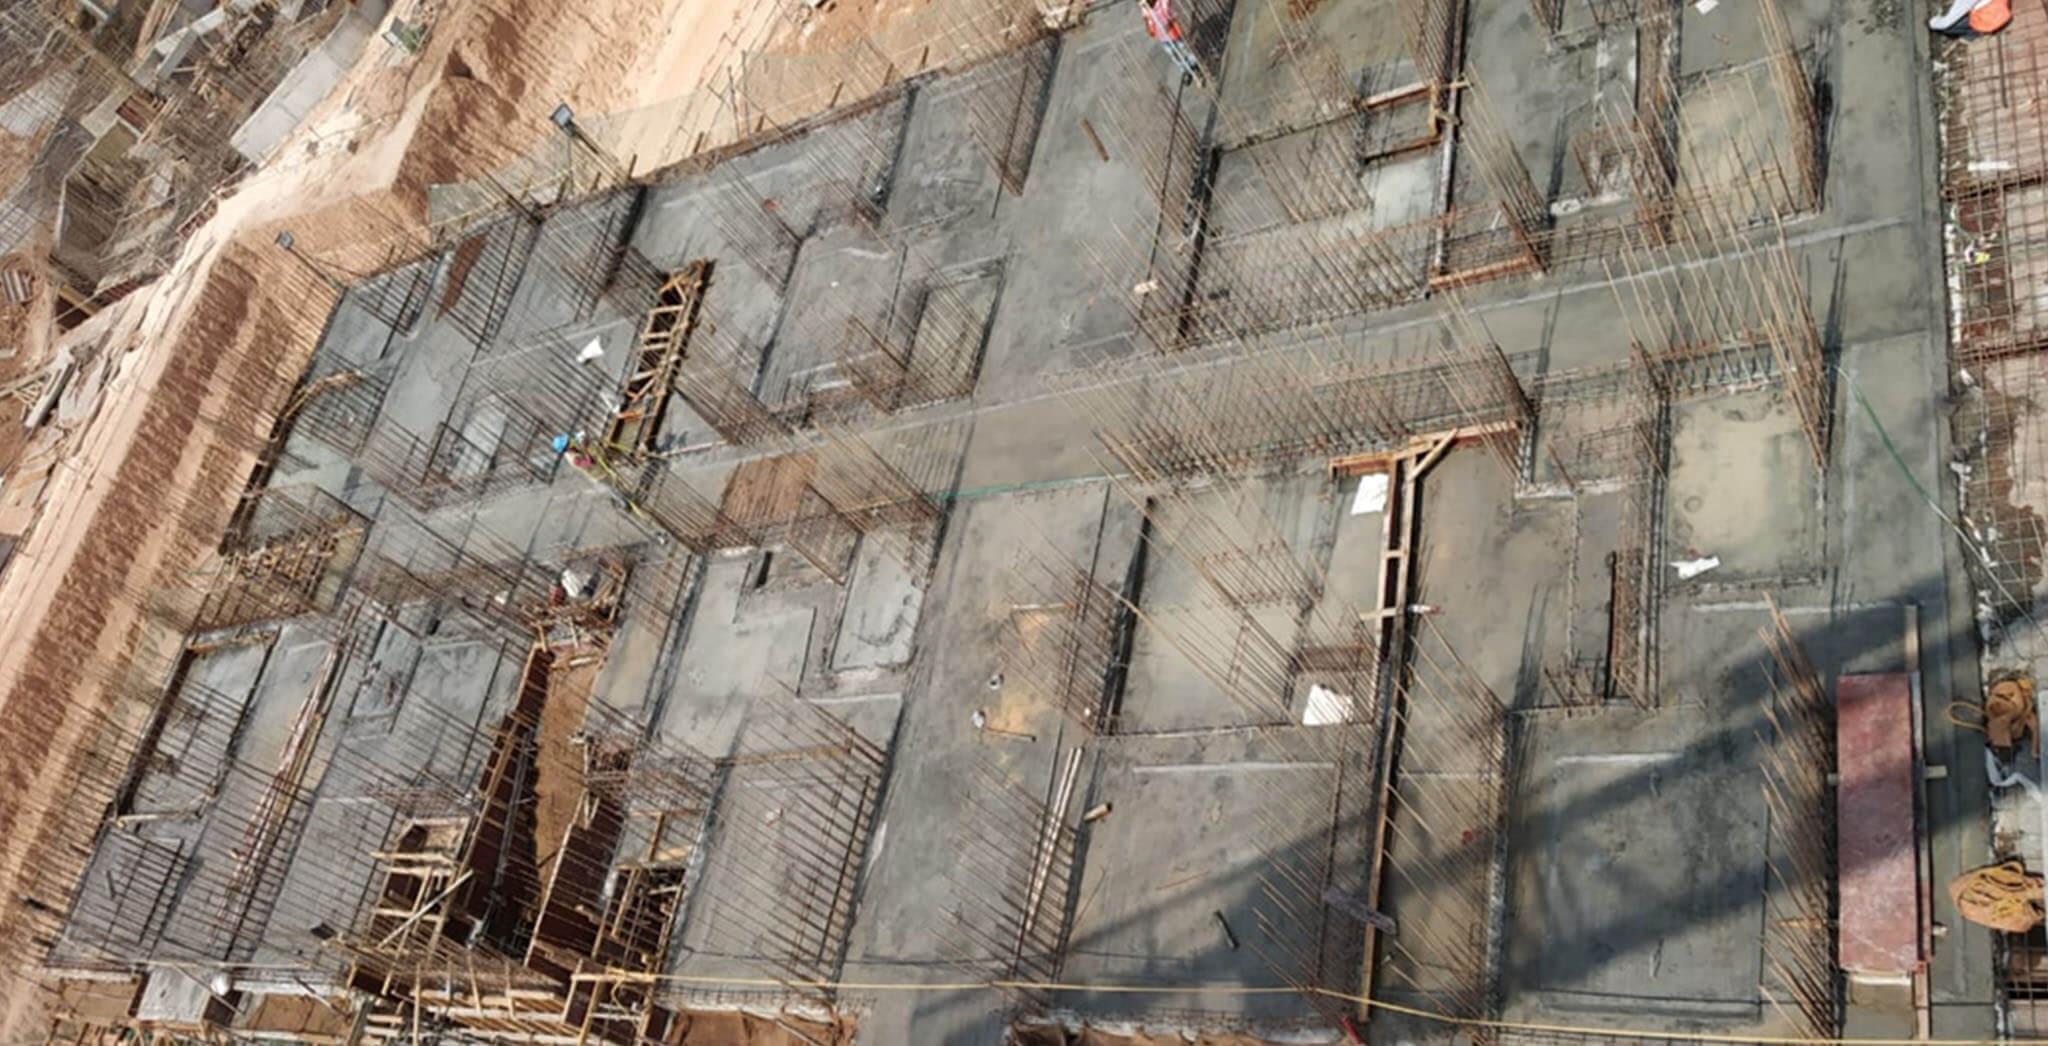 Apr 2021 - Jasper Block: Wing A—A bird's eye view of the ground floor